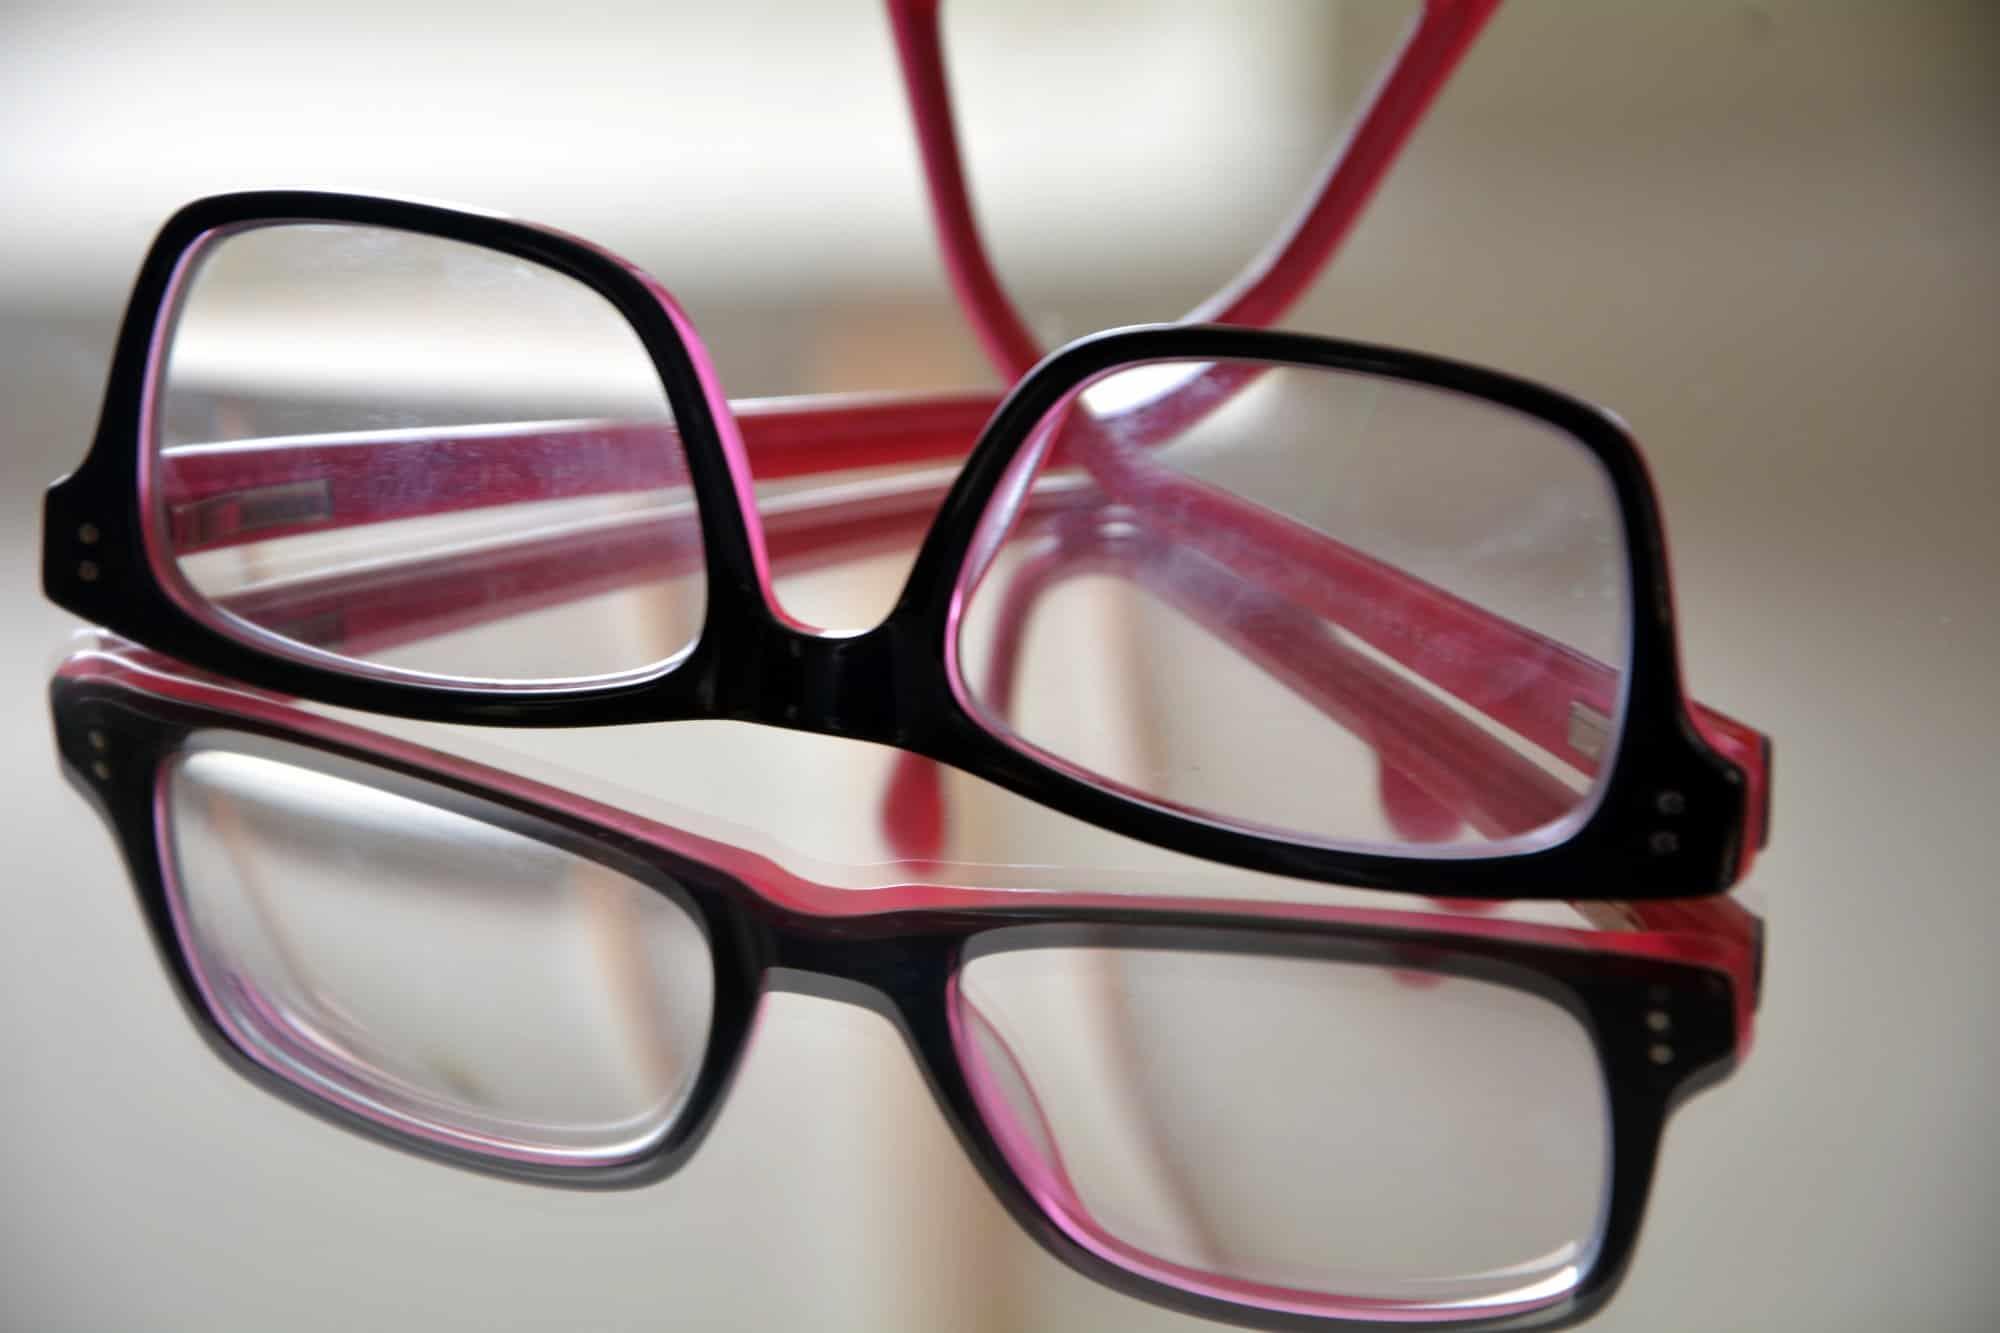 9d56933f3 اوقات دوام ومميزات نظارات المها : العروض الجديدة Al Maha Opticals ...